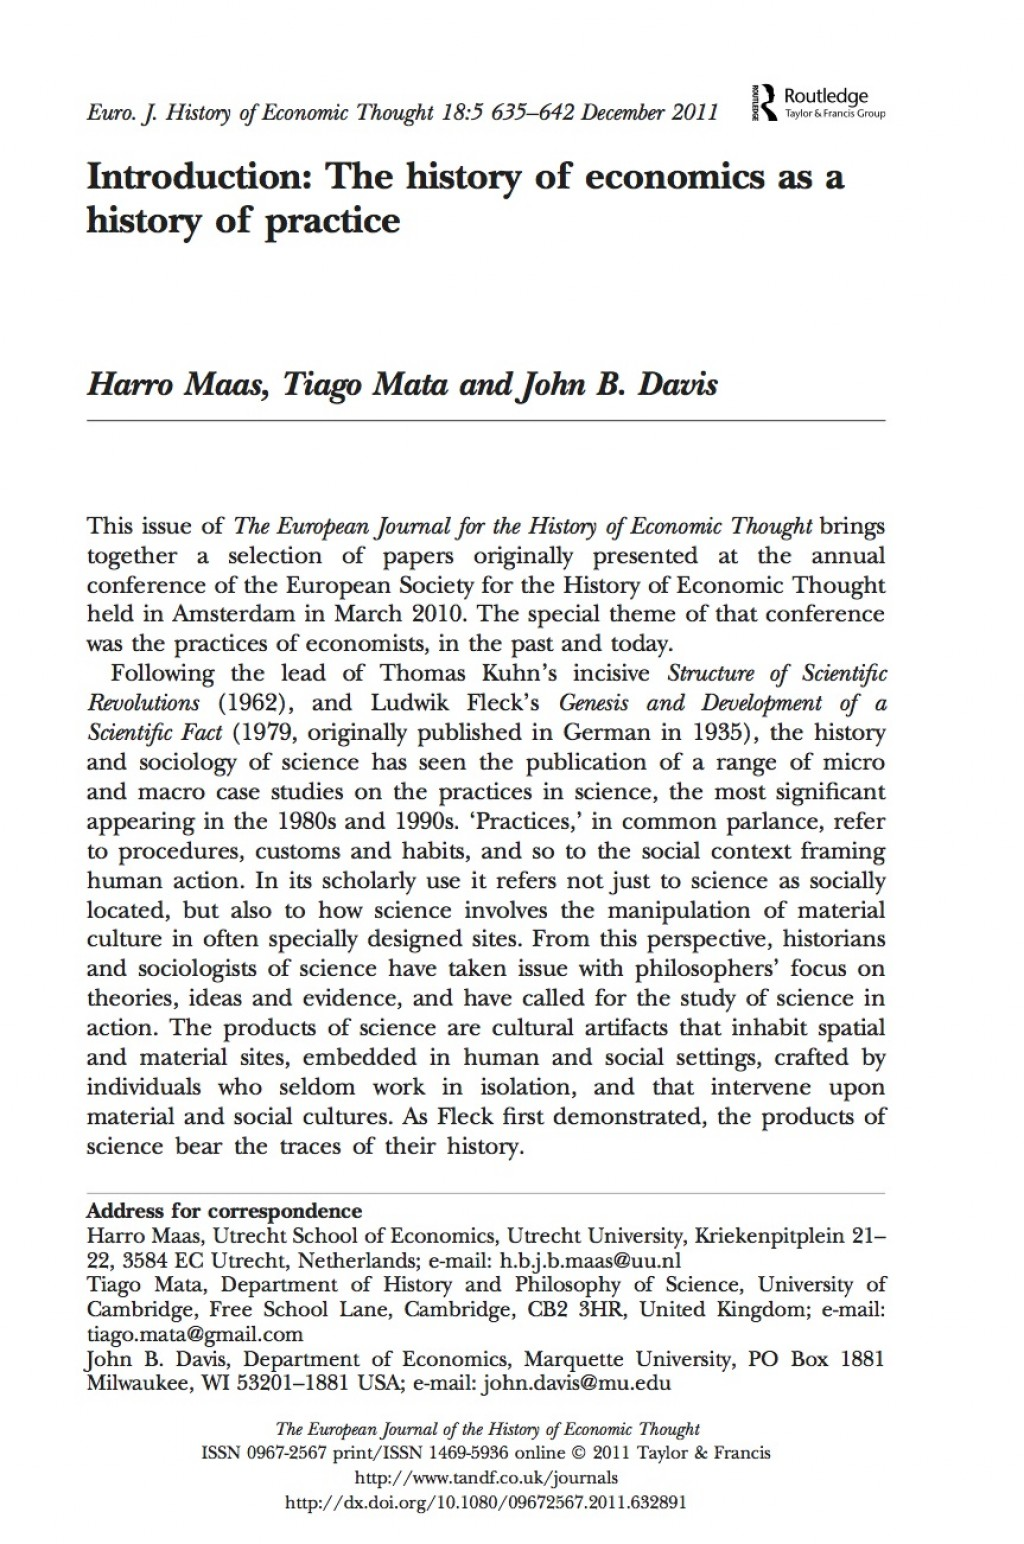 002 Self Introduction Sample Essay Example College Essays